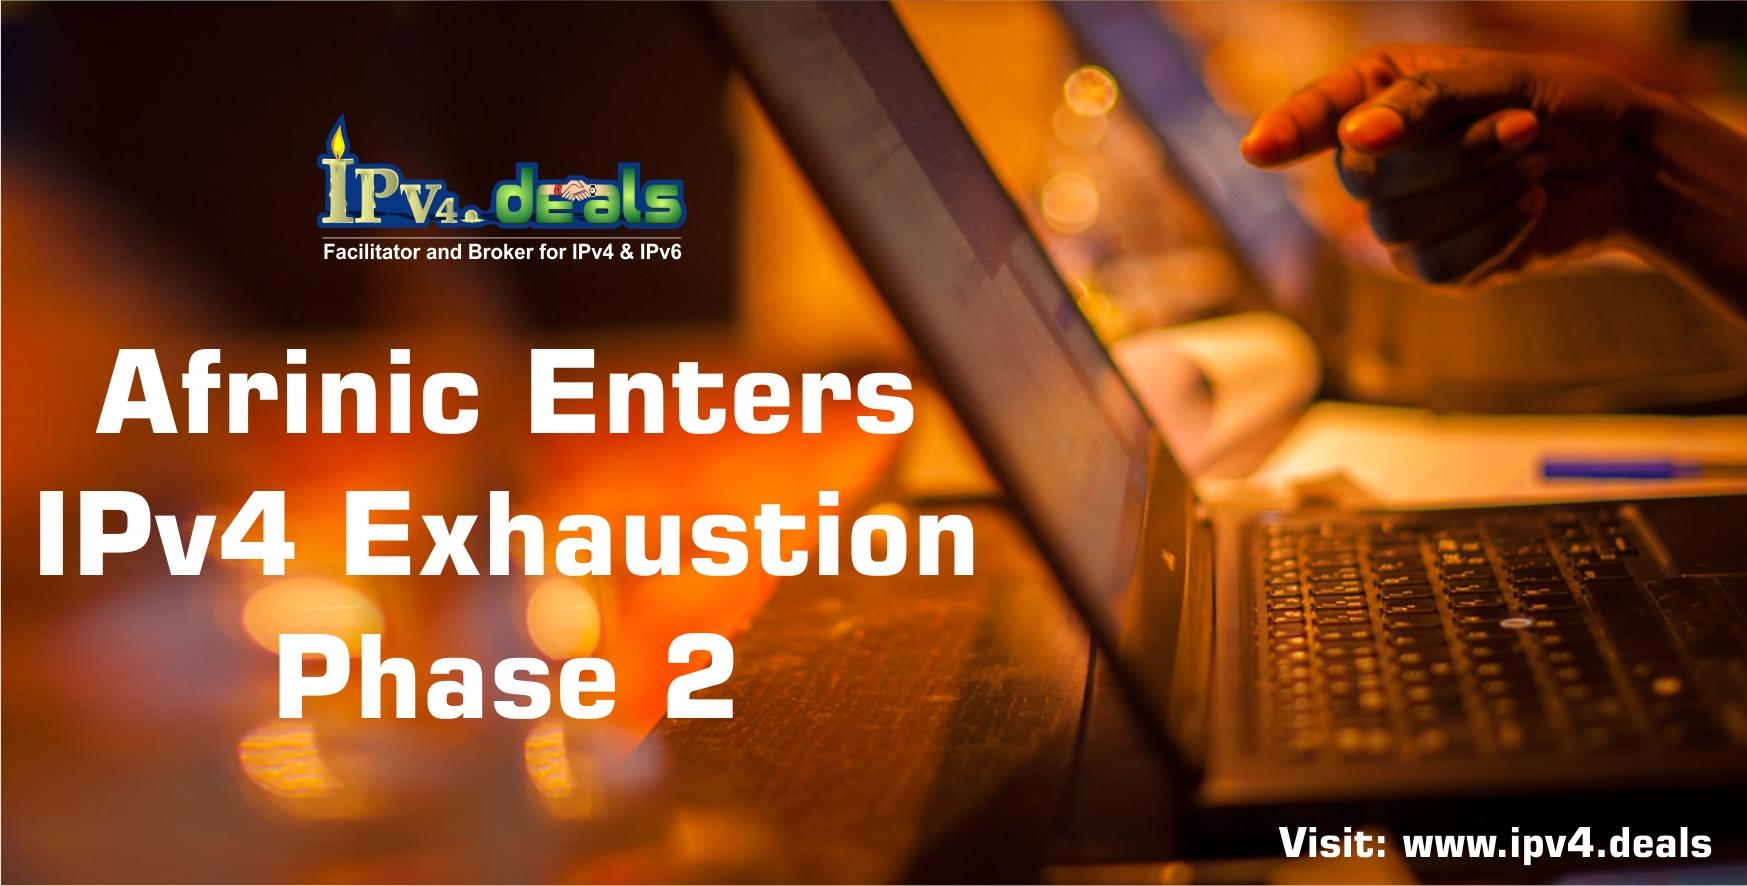 AFRINIC Enters IPv4 Exhaustion Phase 2